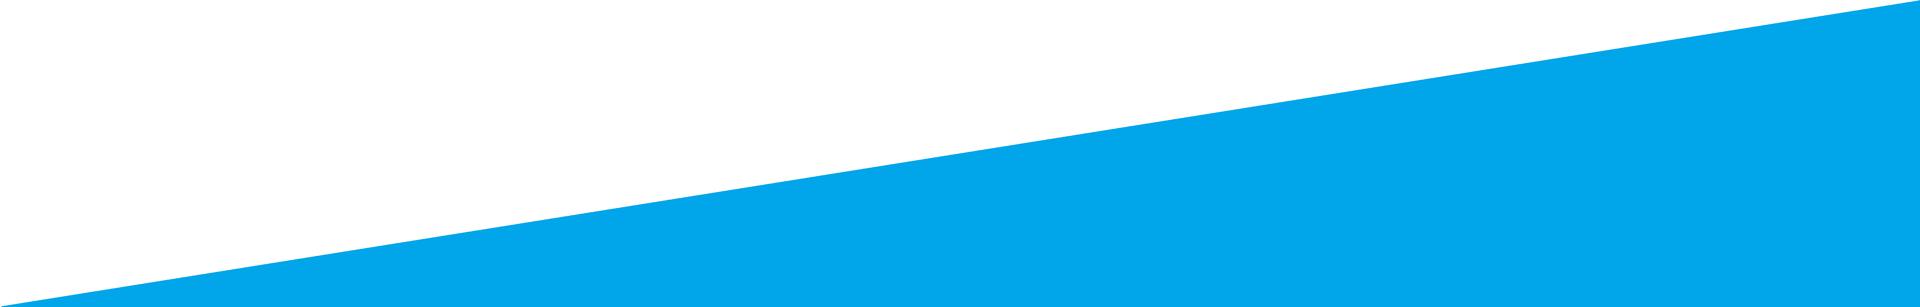 blau_o